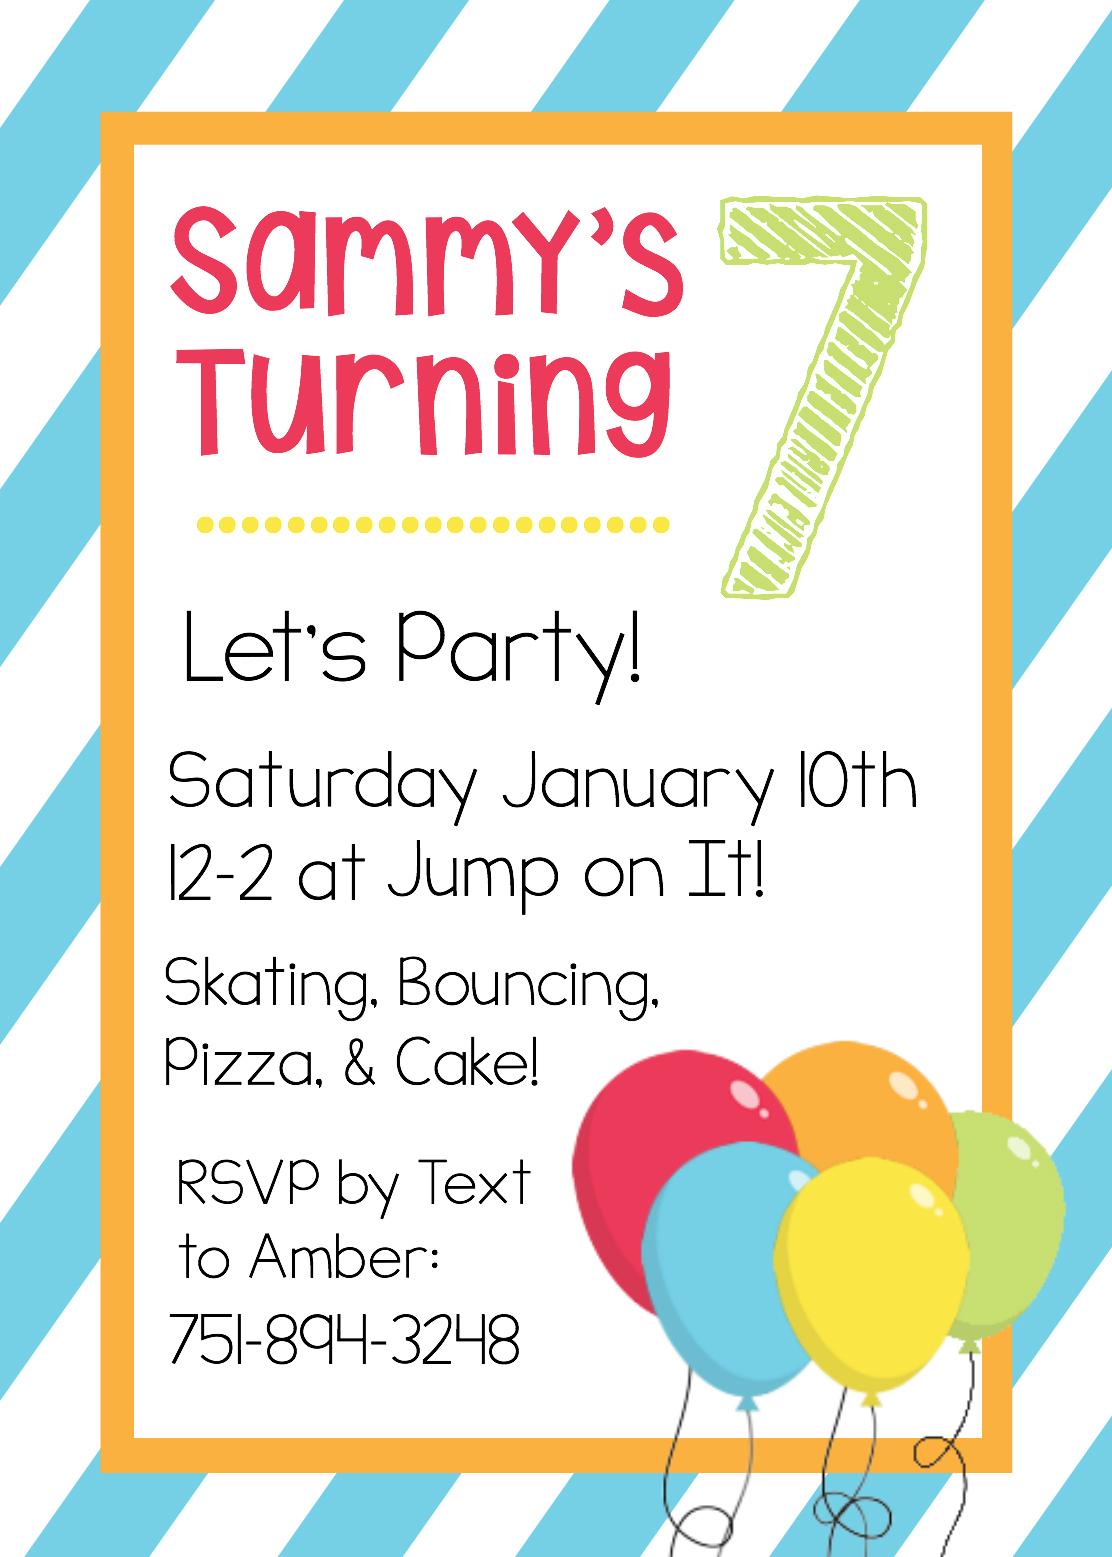 Free Printable Birthday Invitation Templates - Free Printable Personalized Birthday Invitation Cards